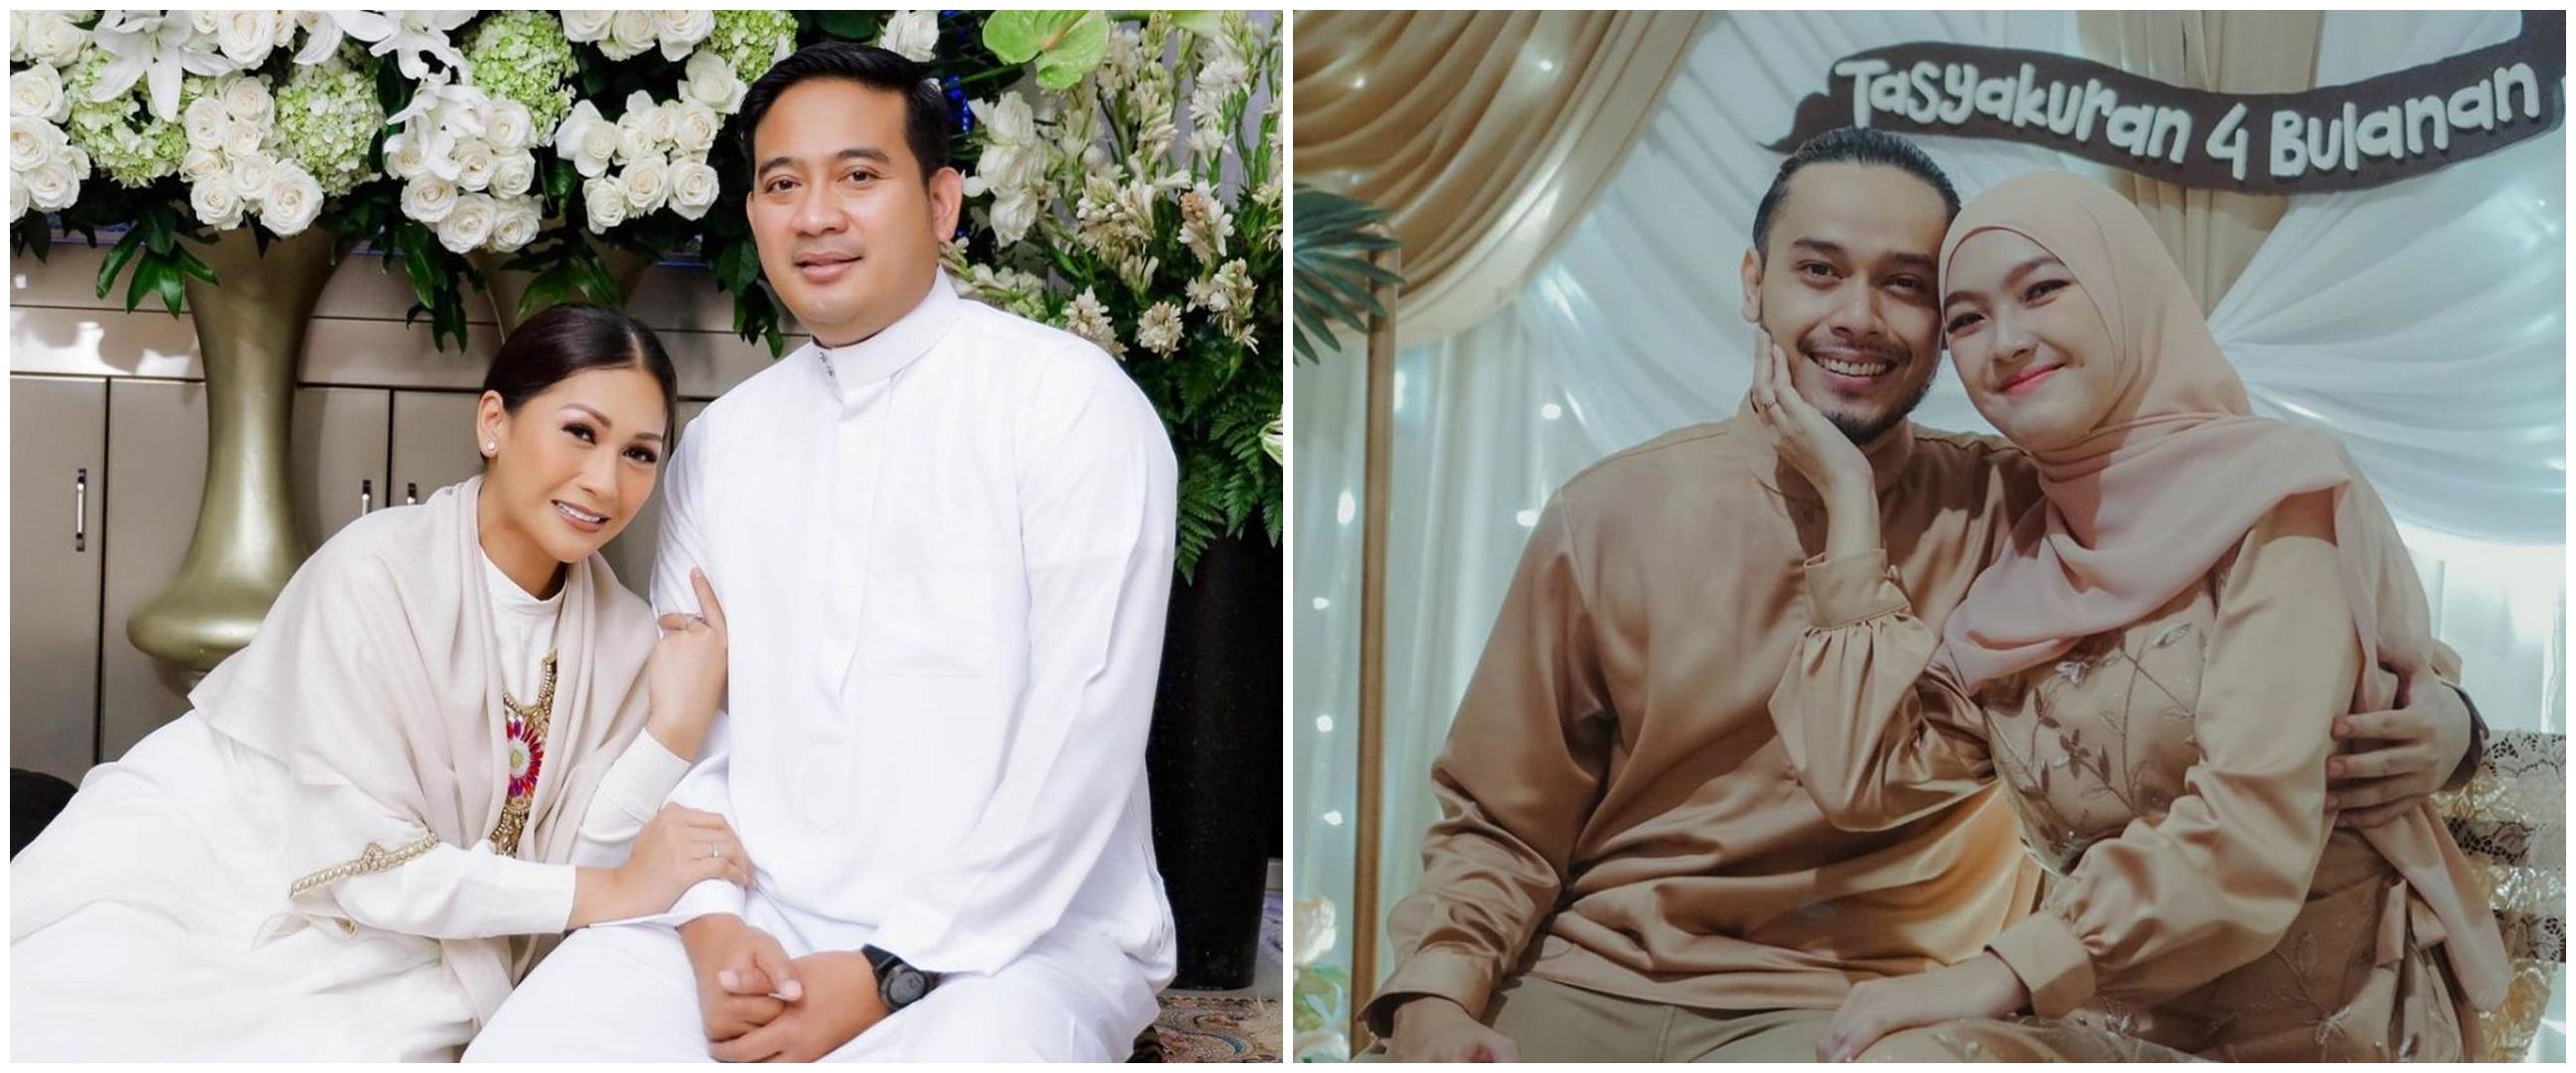 Momen syukuran 4 bulanan 7 seleb, Tata Janeeta usung dresscode putih